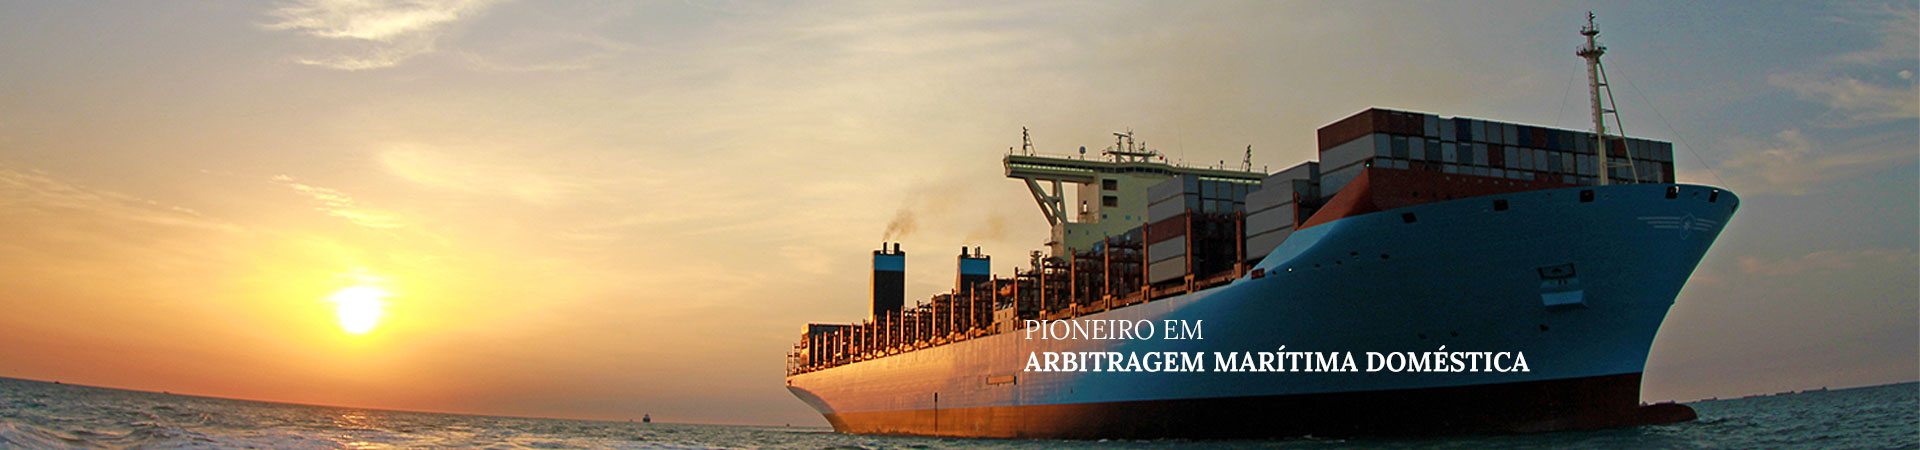 Slide-01-arbitragem-maritima-01